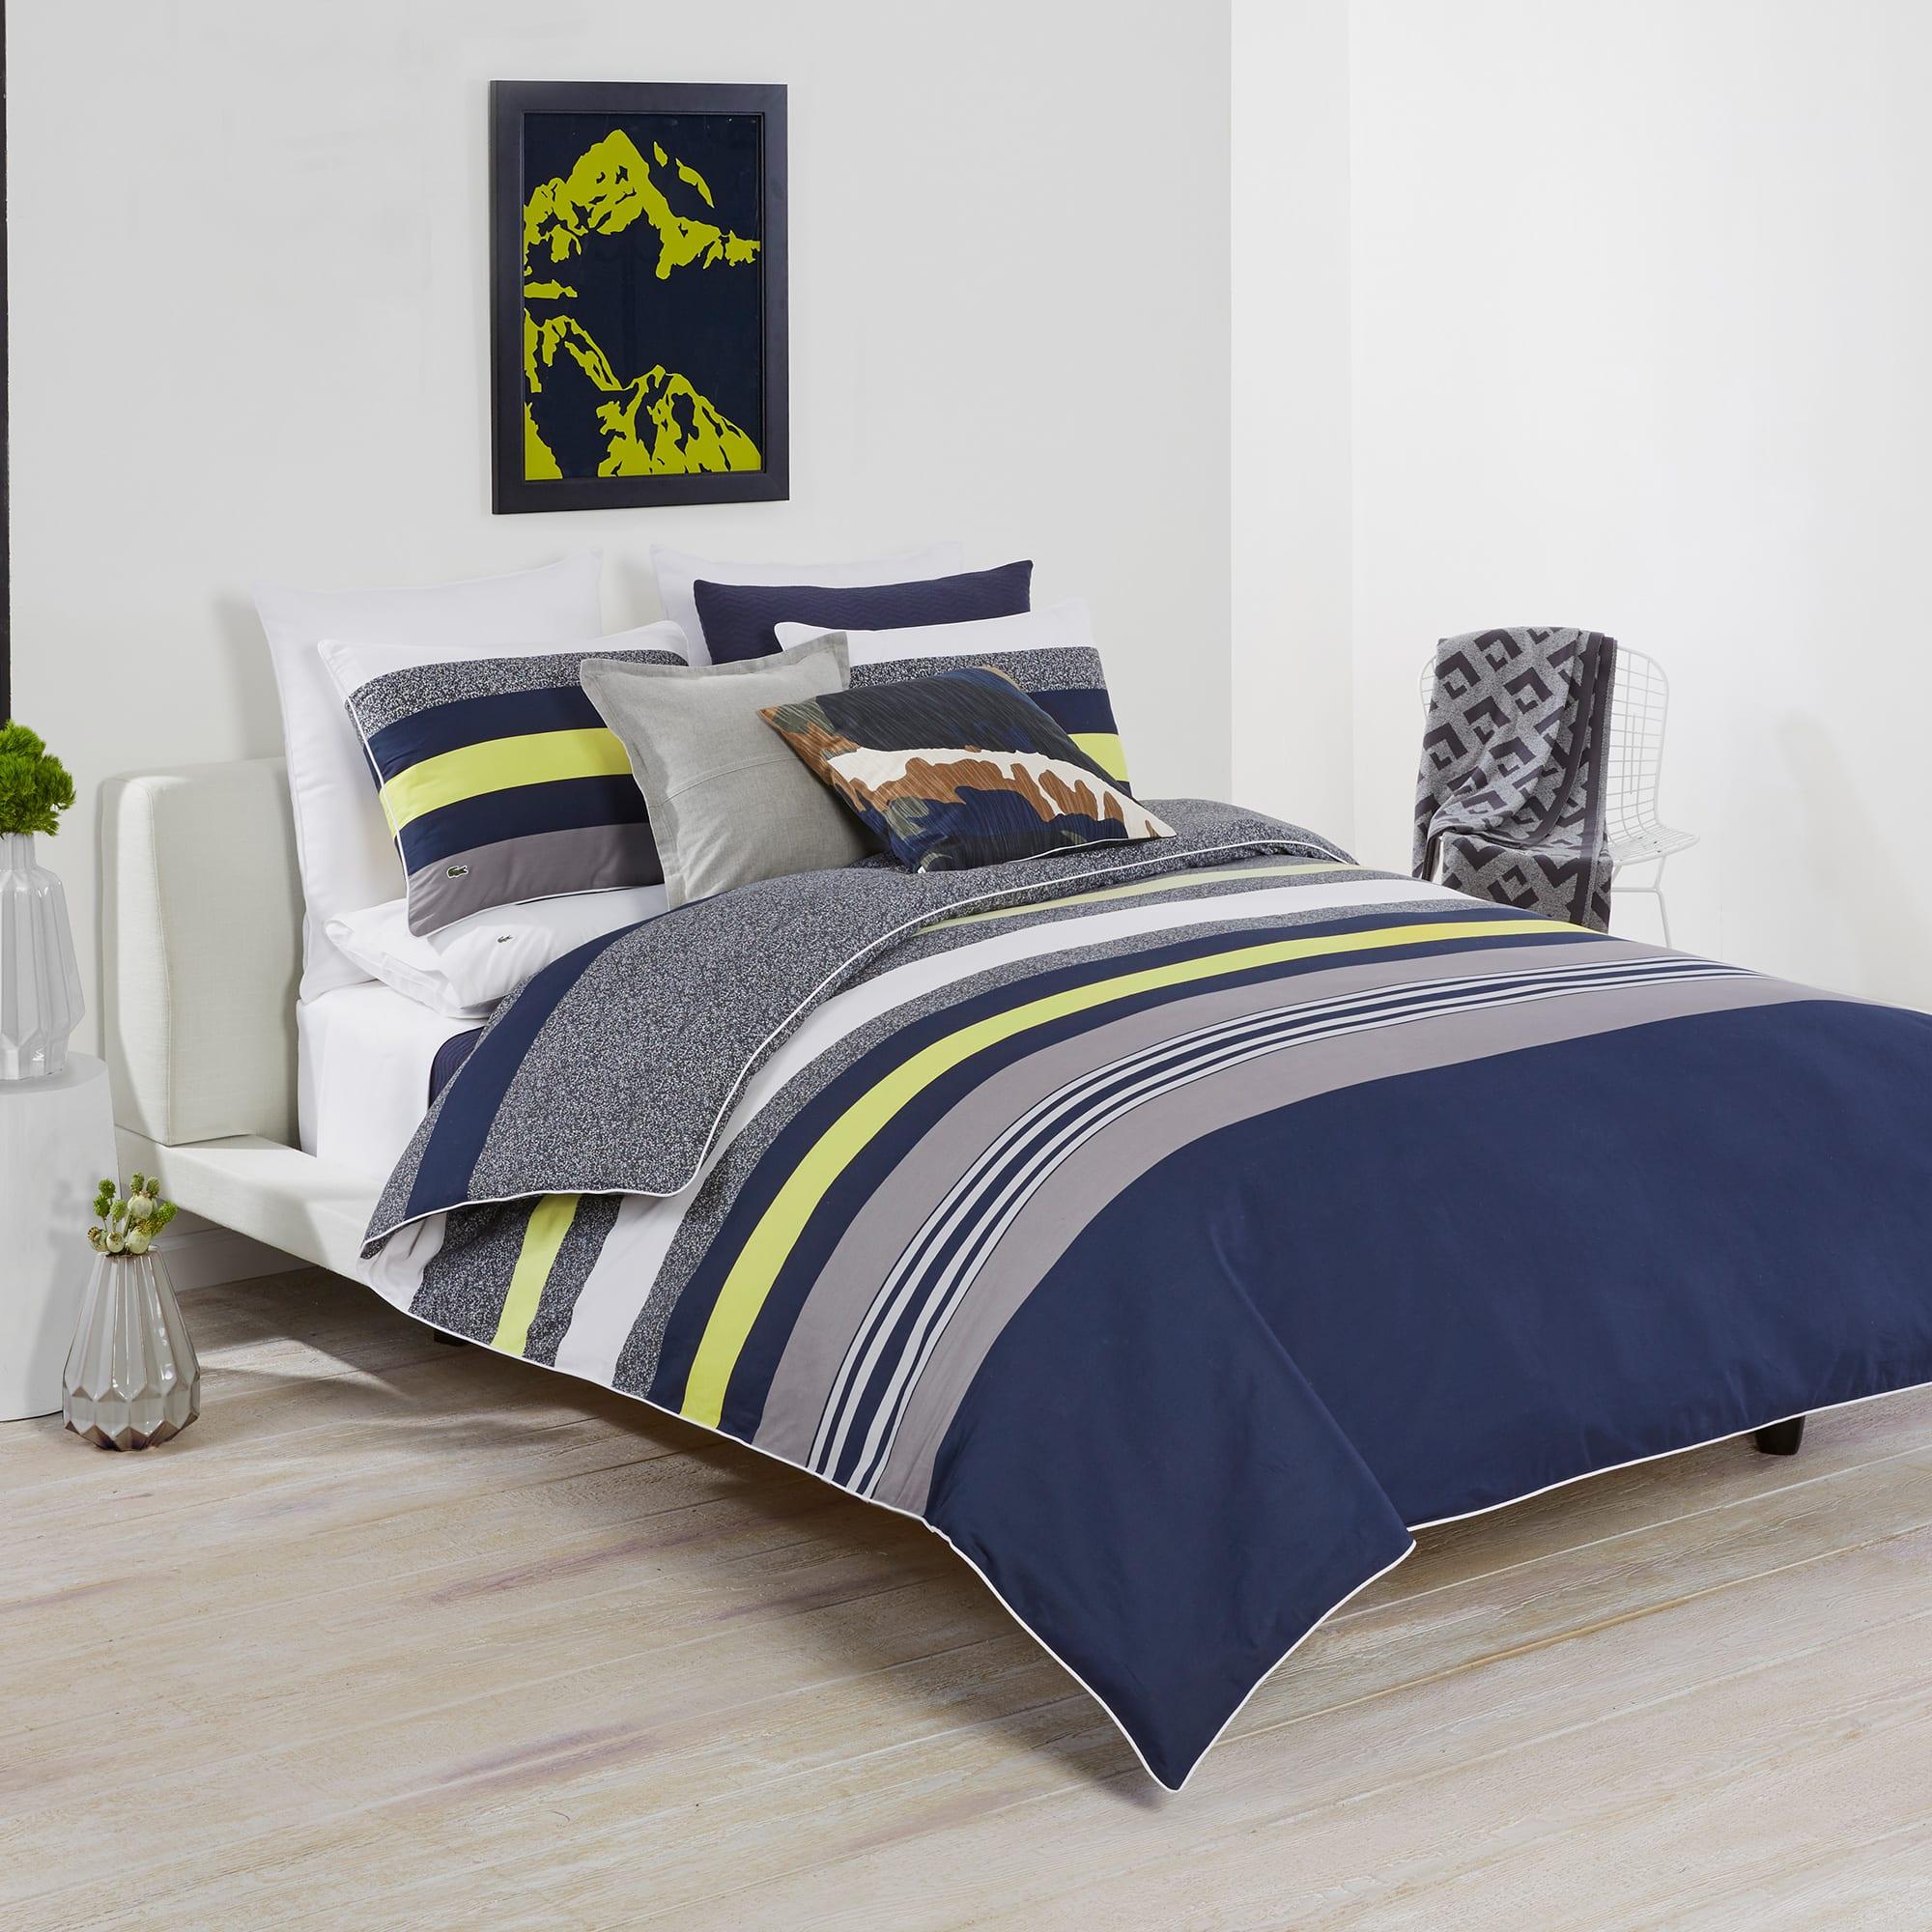 org blue lacoste titanicinternational auckland sets duvet cover and comforter set canada